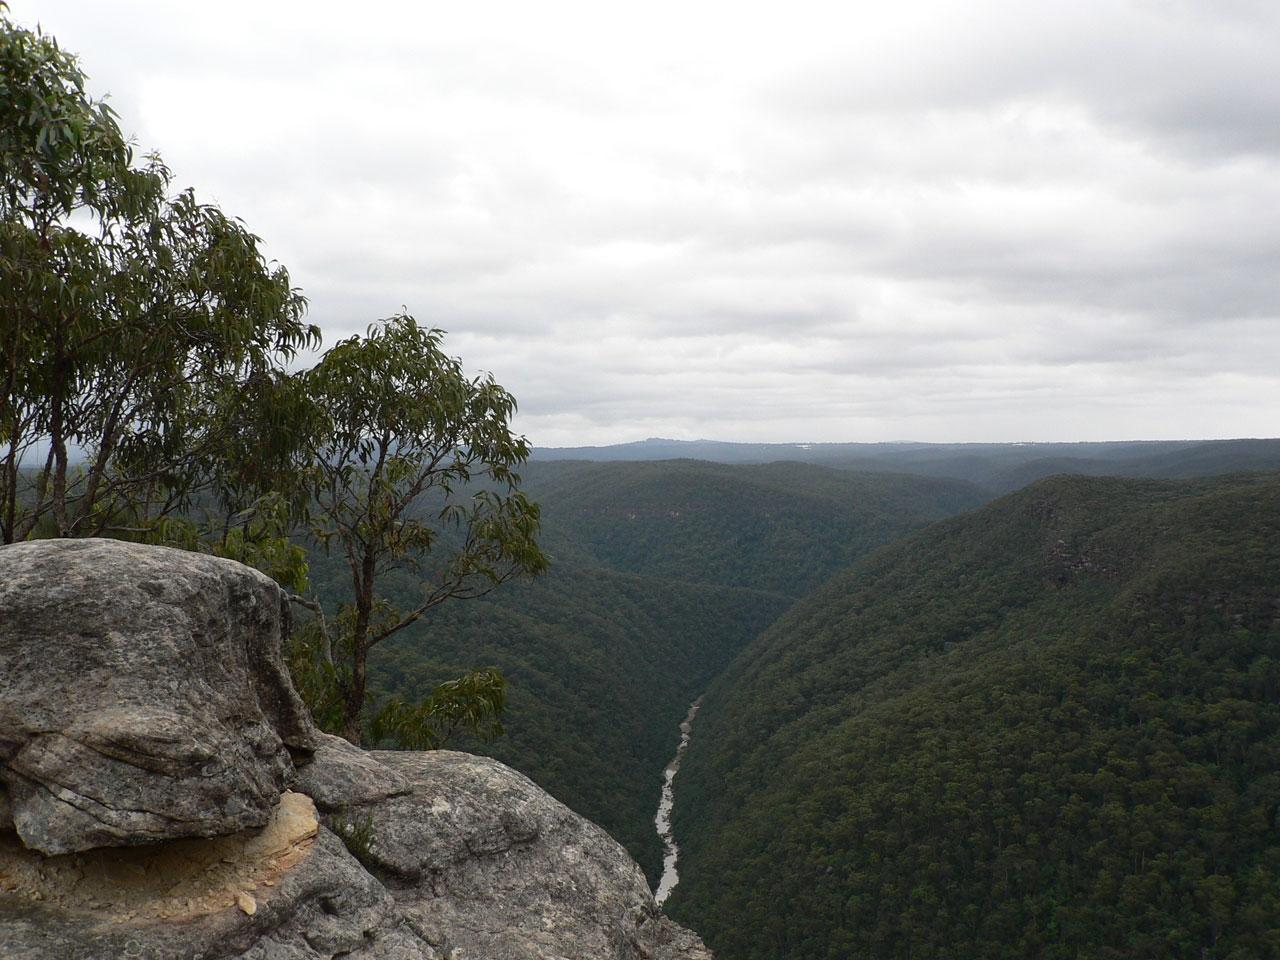 Faulconbridge Point